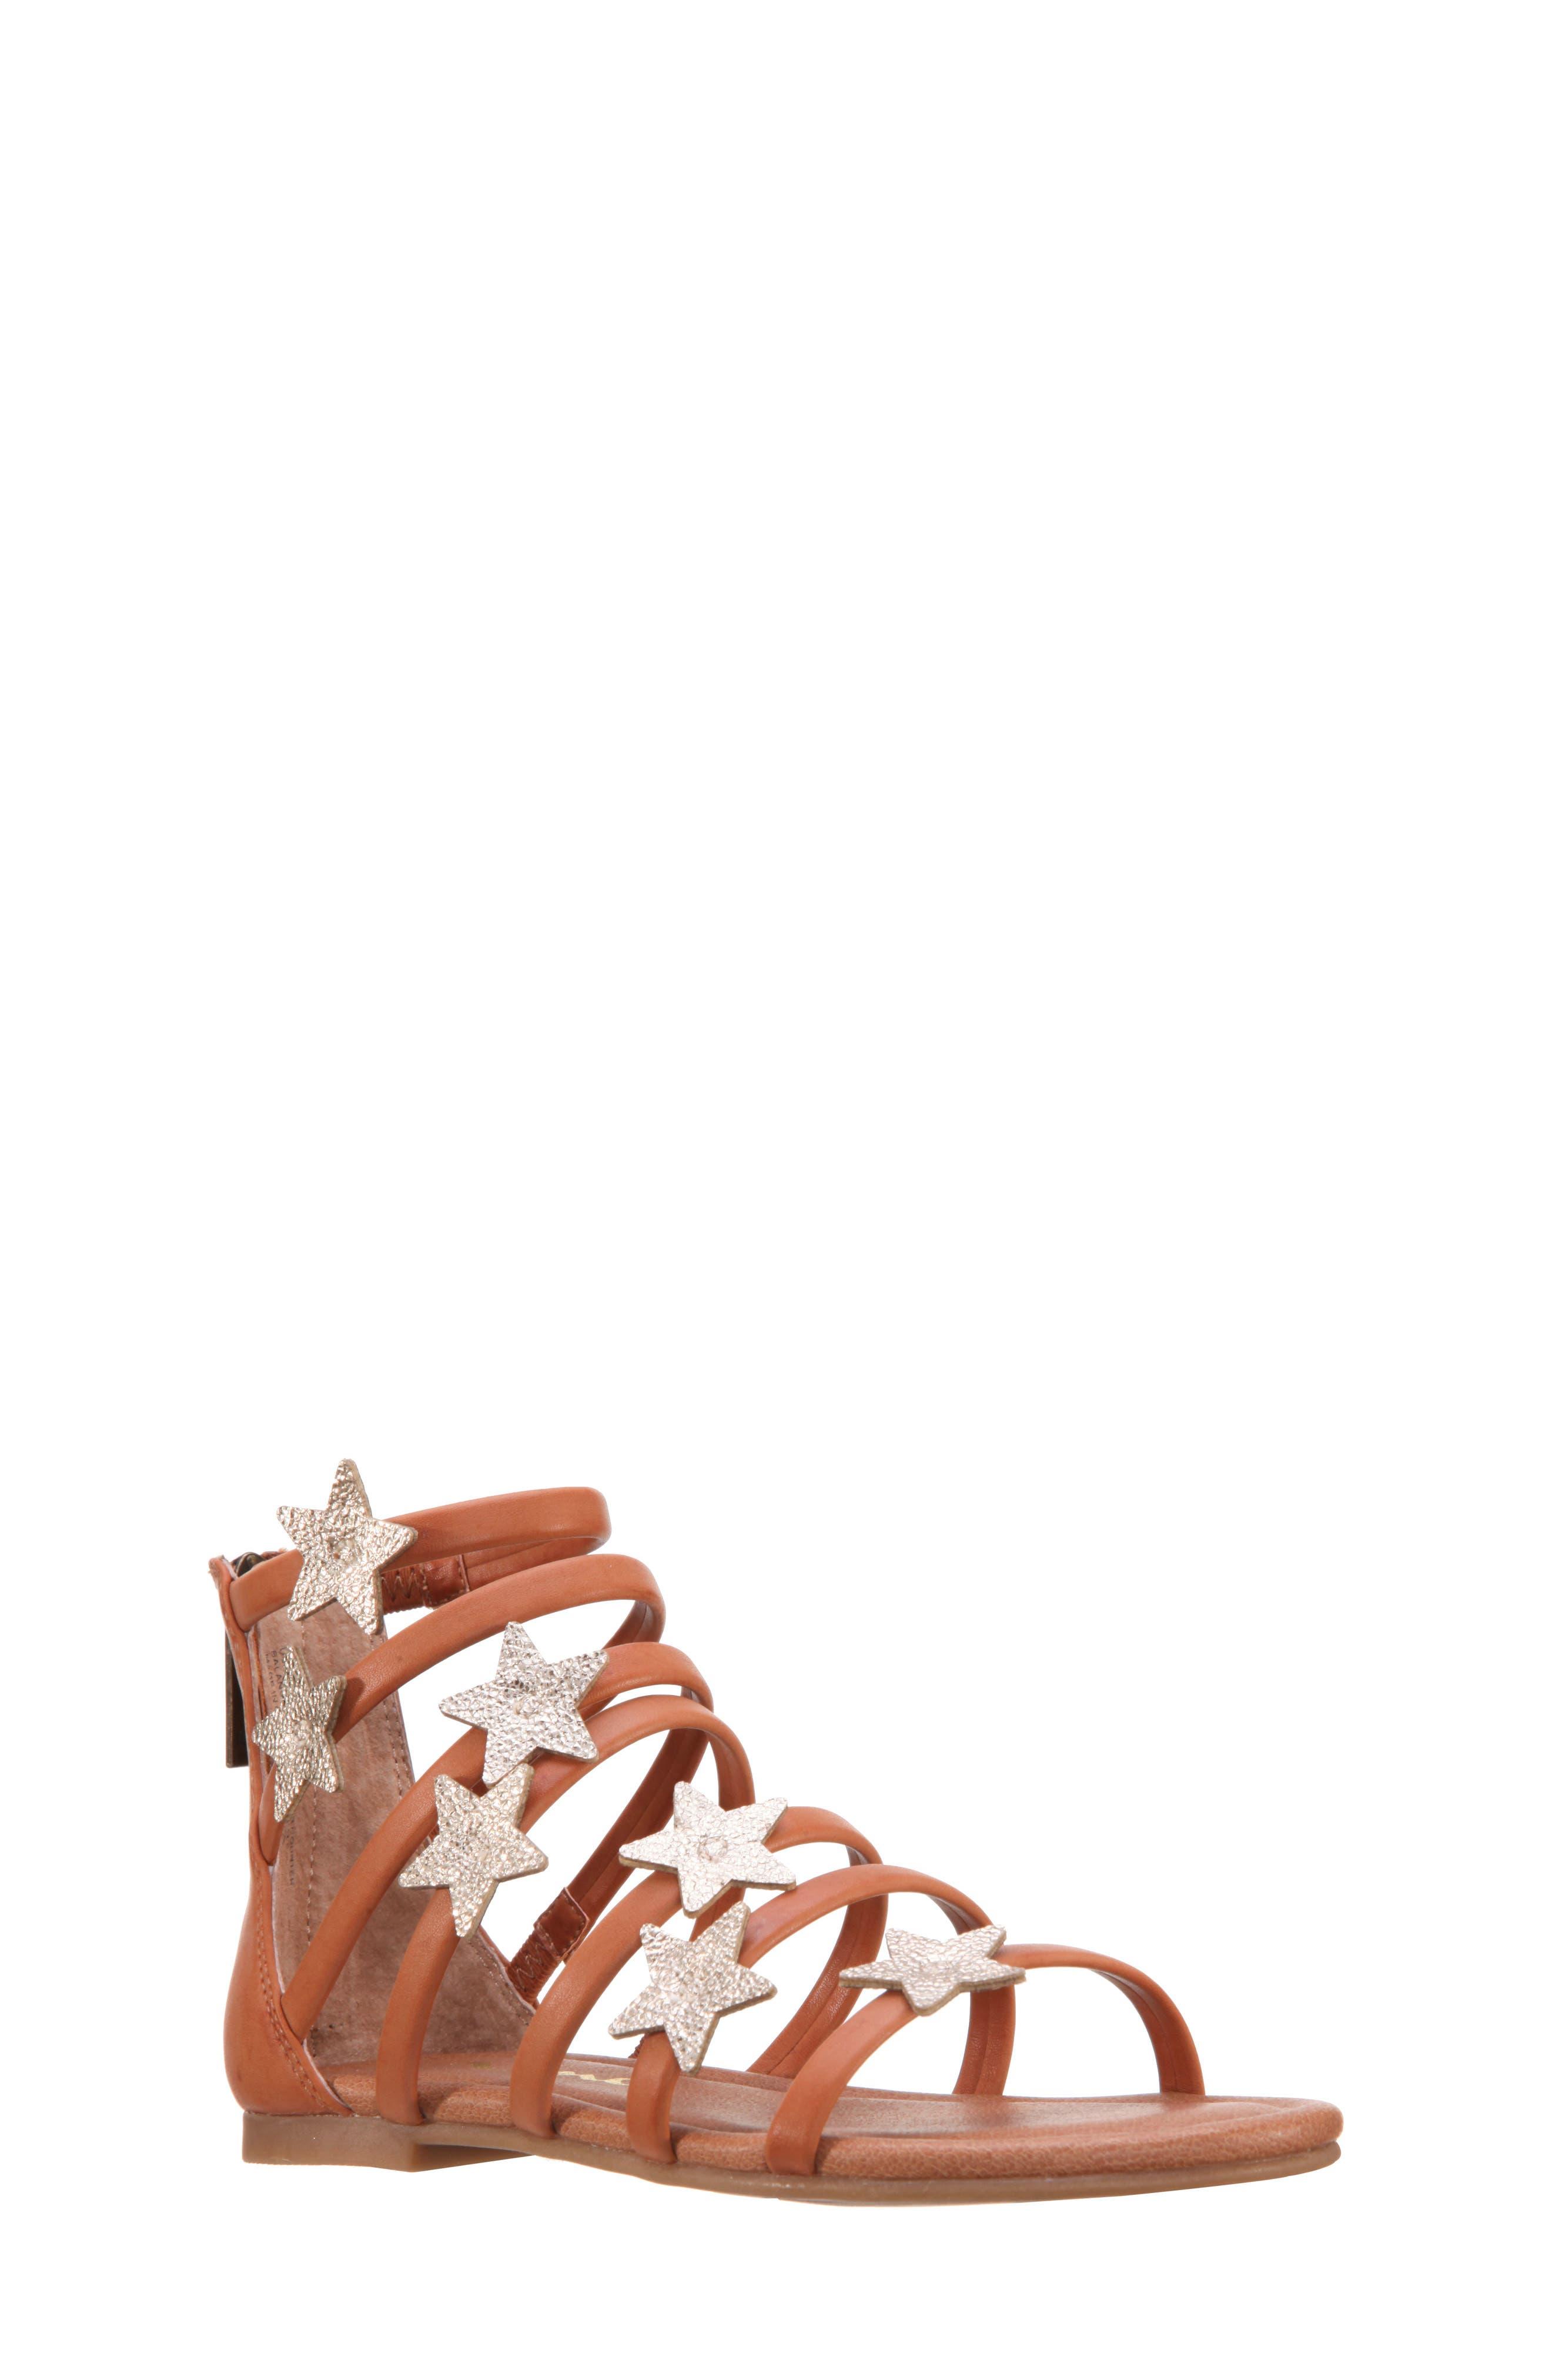 Robertha Gladiator Sandal,                         Main,                         color, Tan Smooth/ Gold Metallic